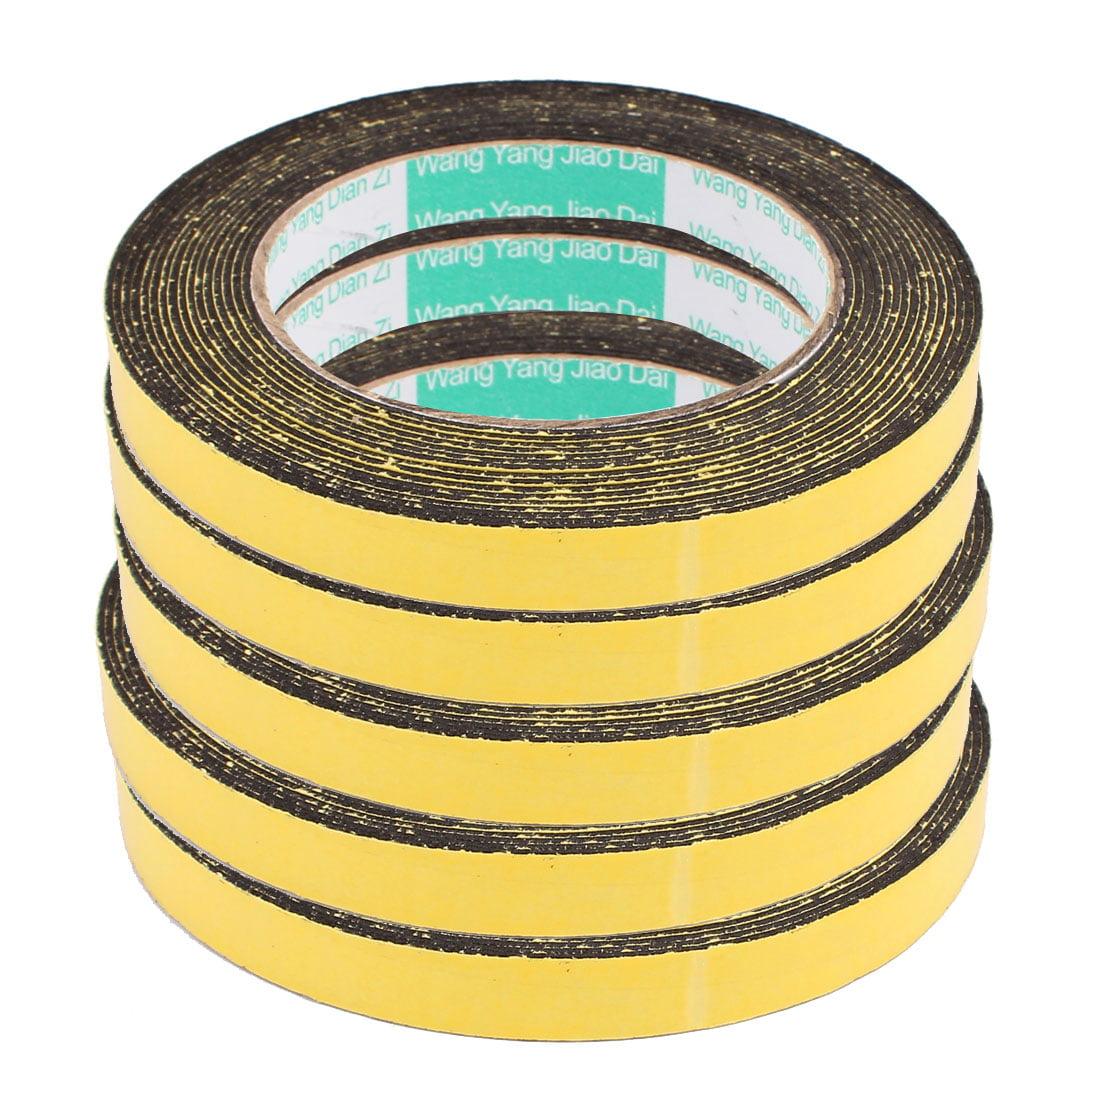 5Pcs 12mm x 1mm Single Sided Self Adhesive Shockproof Sponge Foam Tape 5M Length